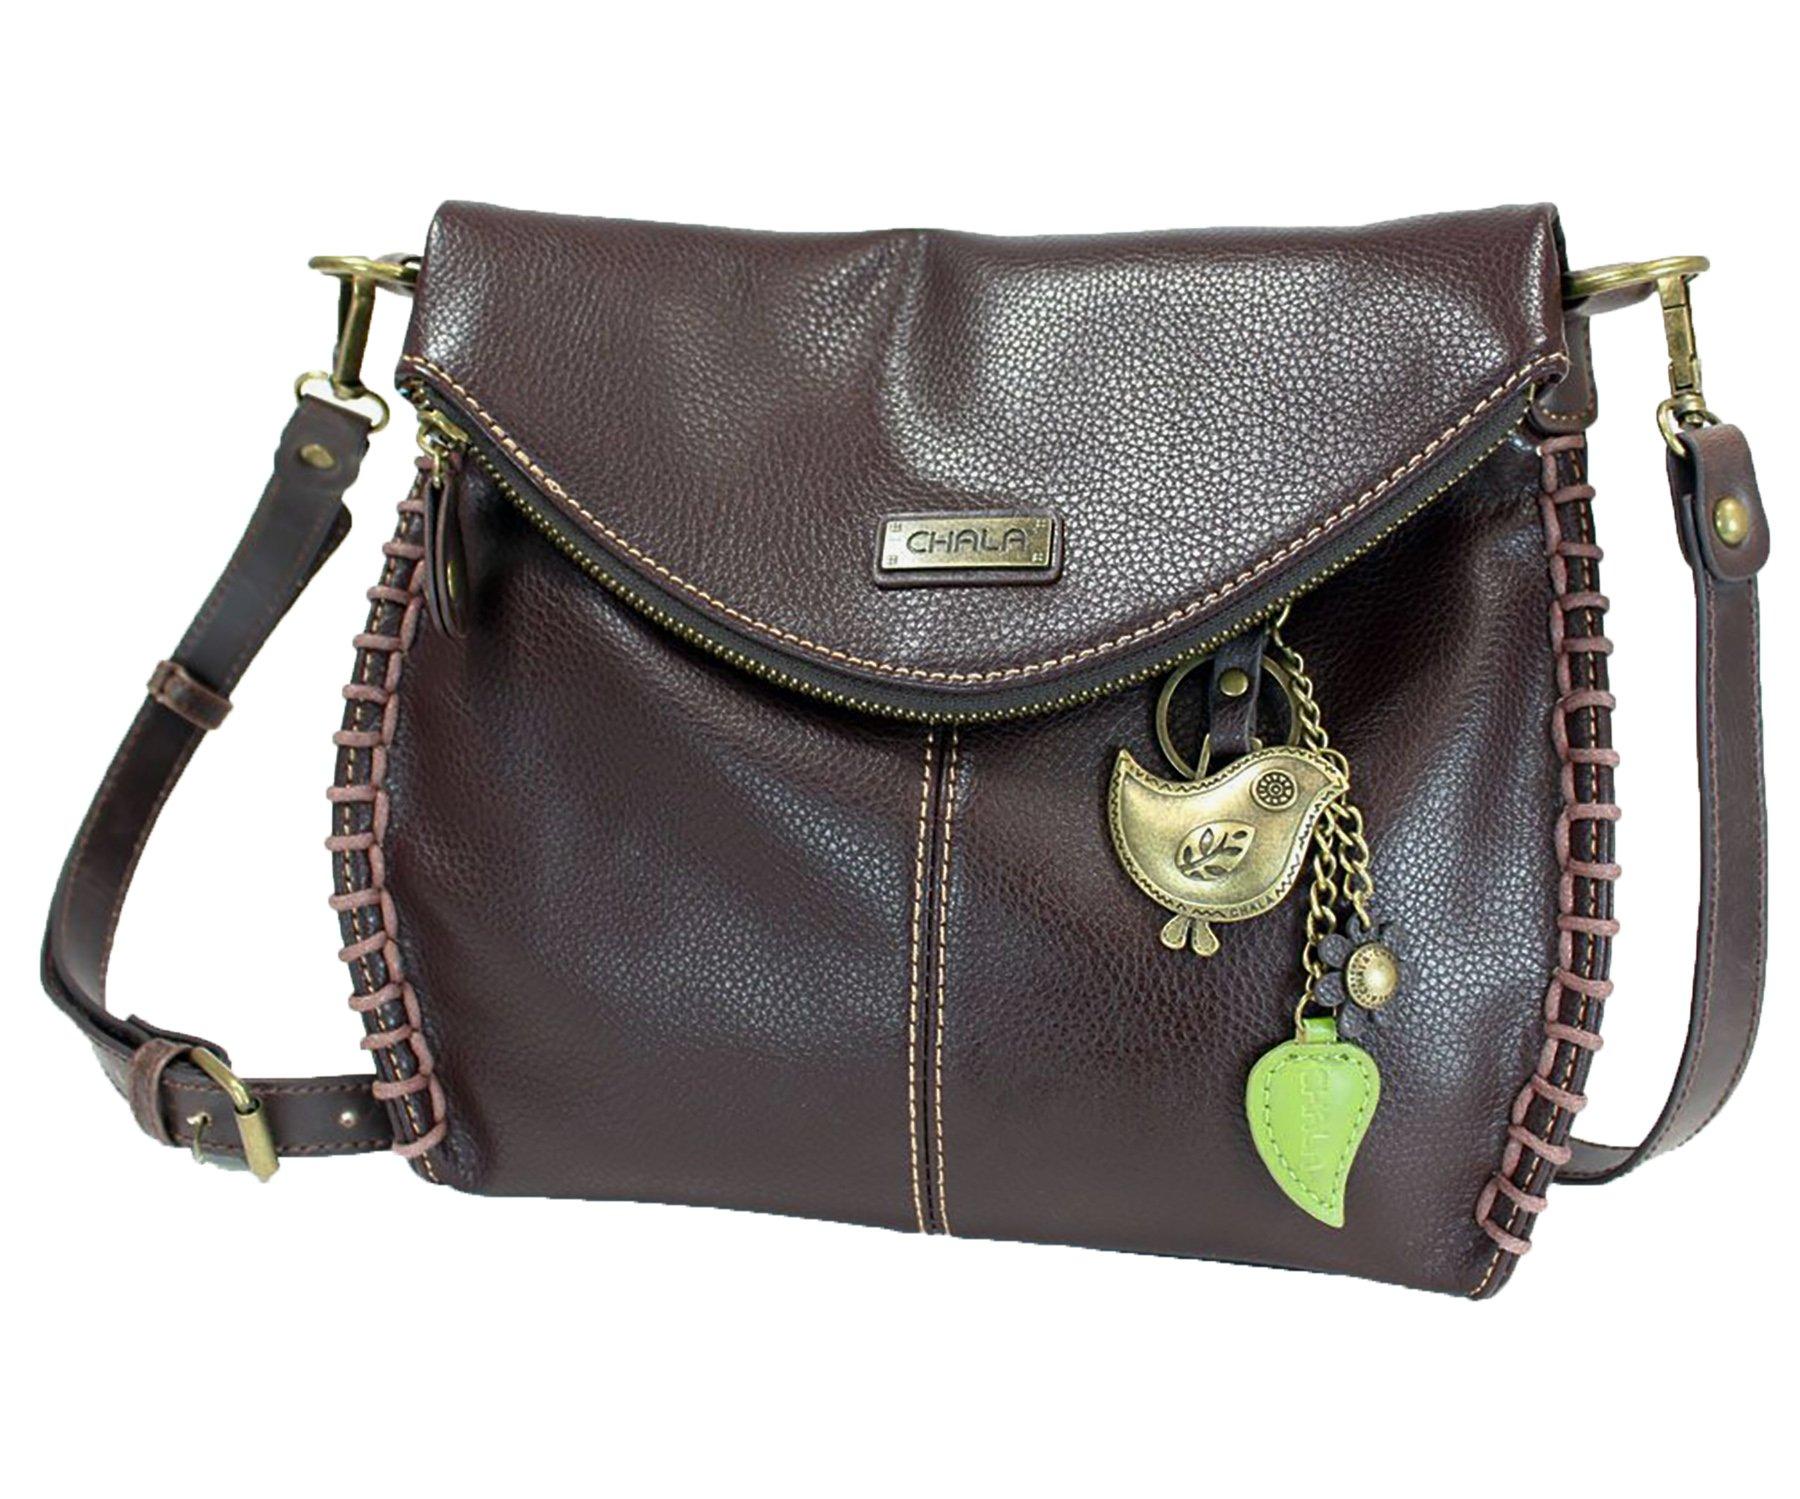 Chala Charming Crossbody Bag with Zipper Flap Top and Metal Chain - Dark Brown - Bird